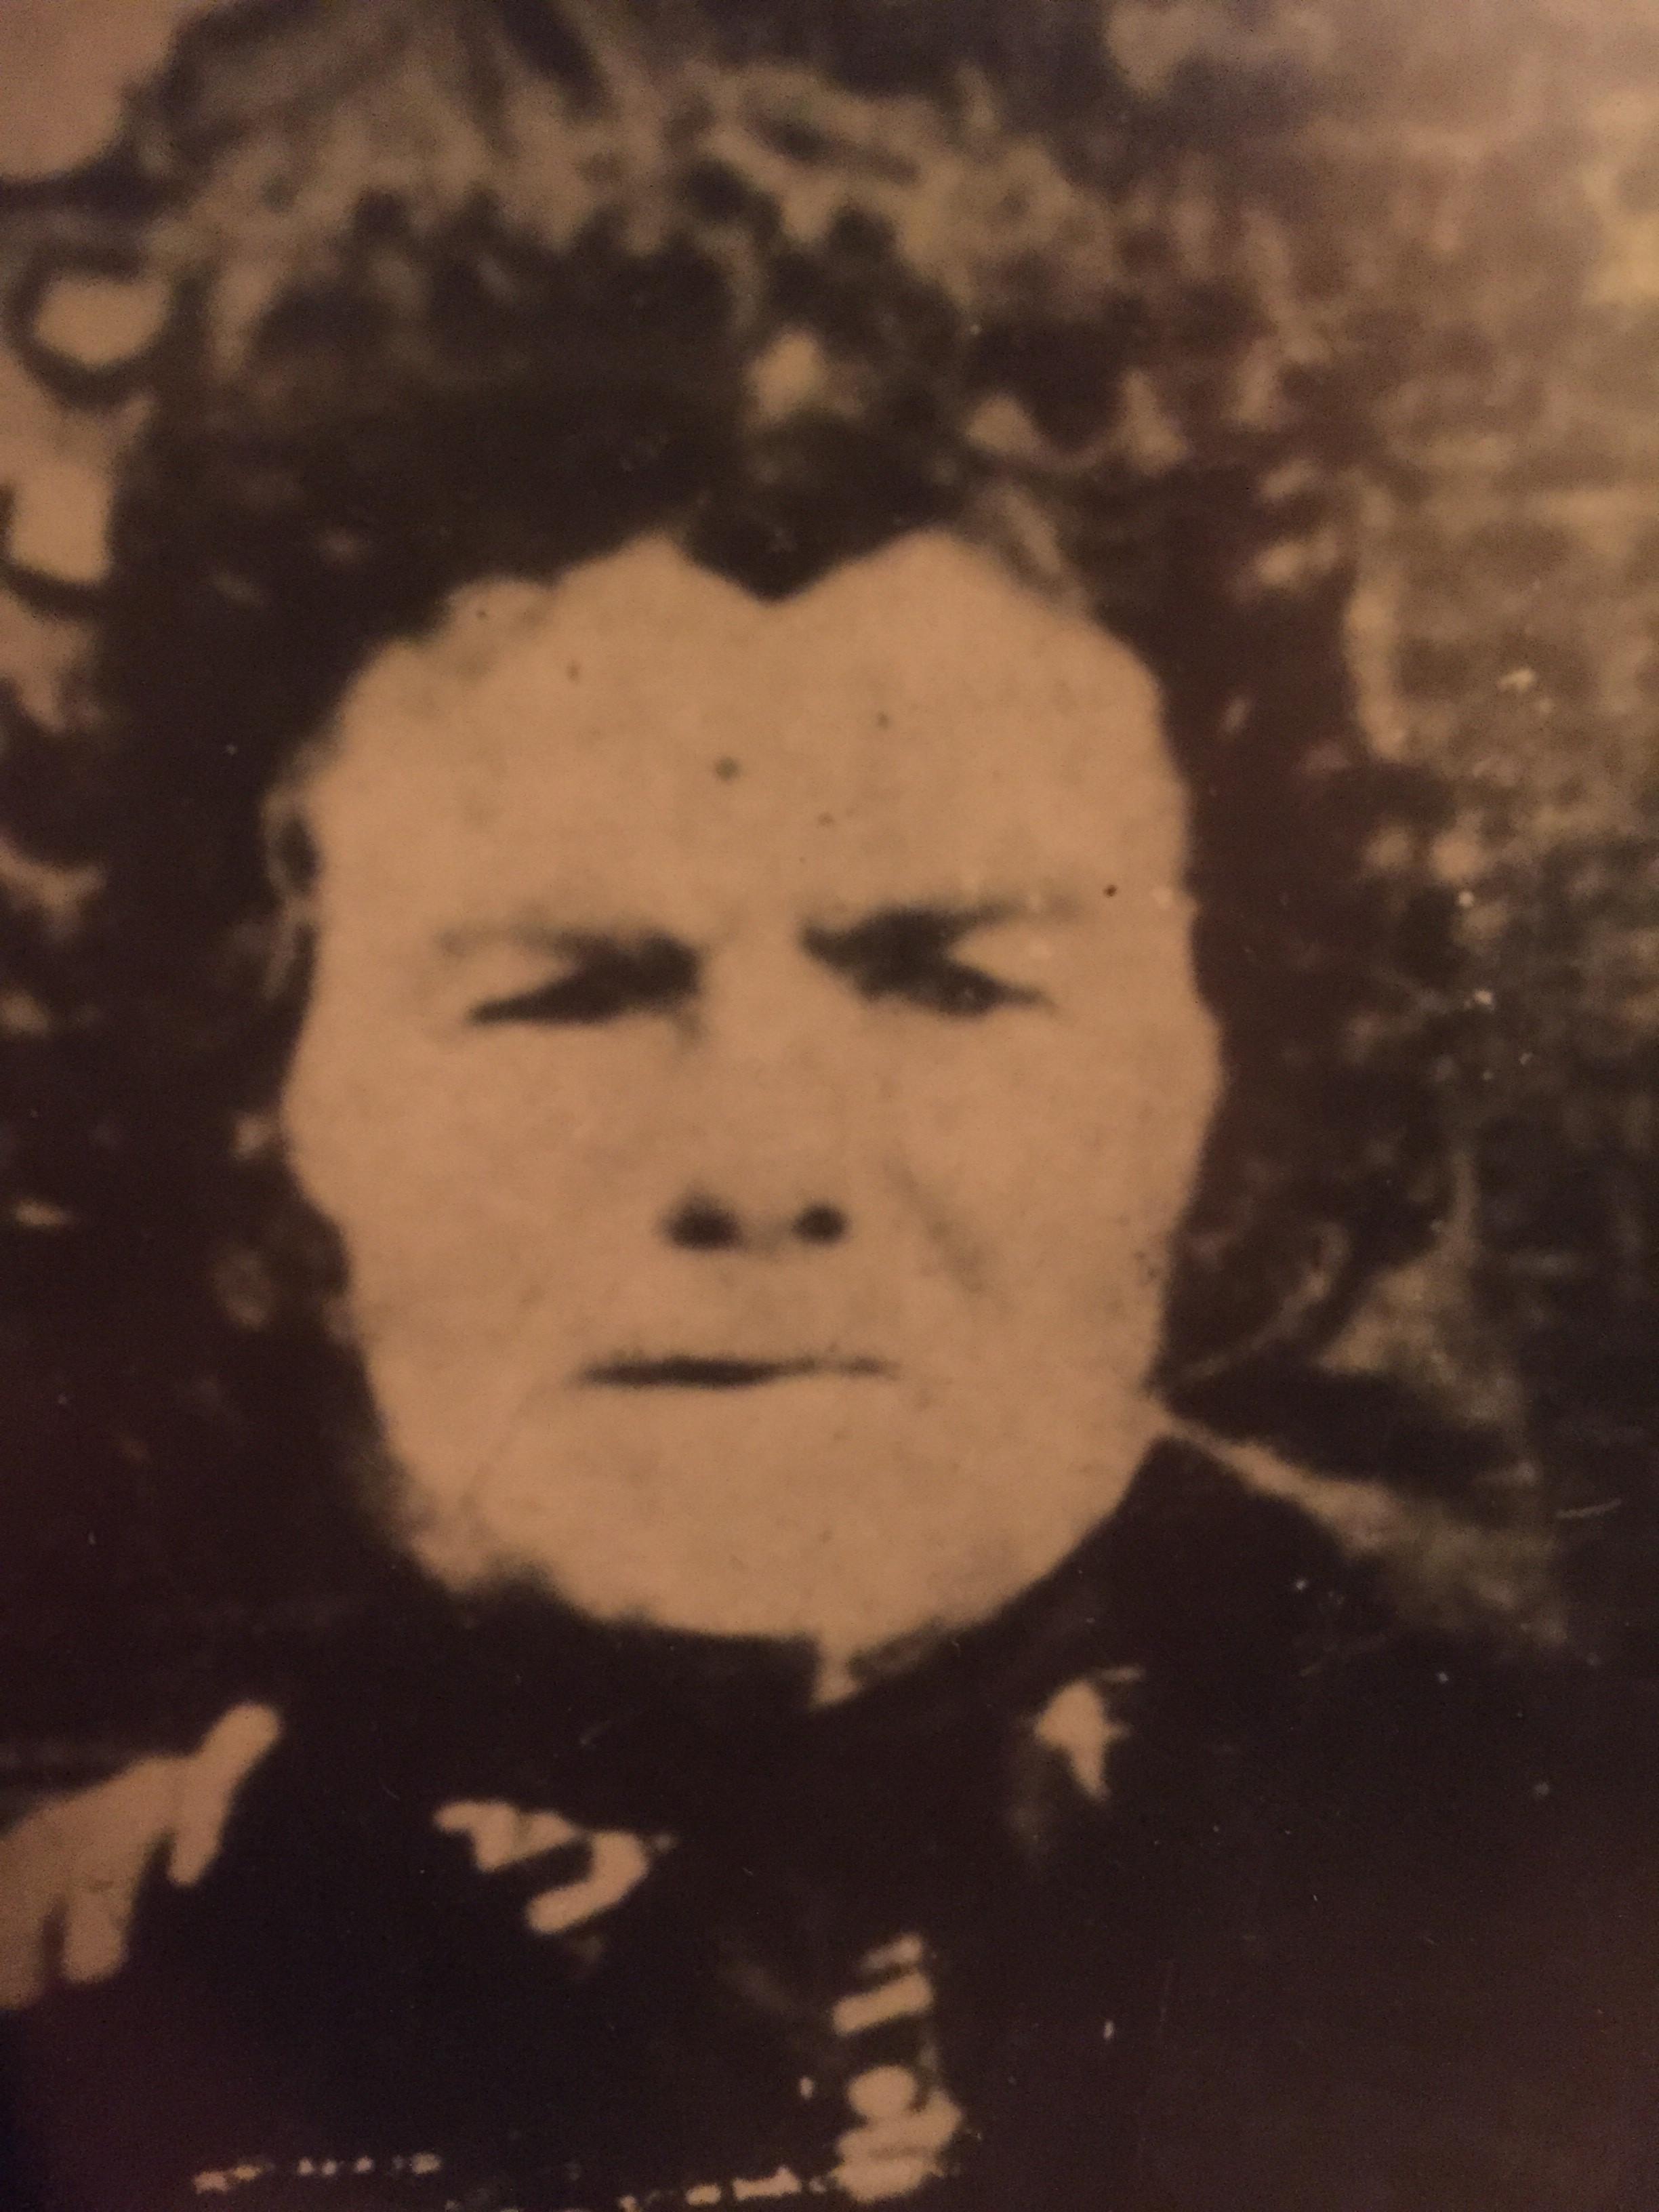 Nikolai Rasmussen